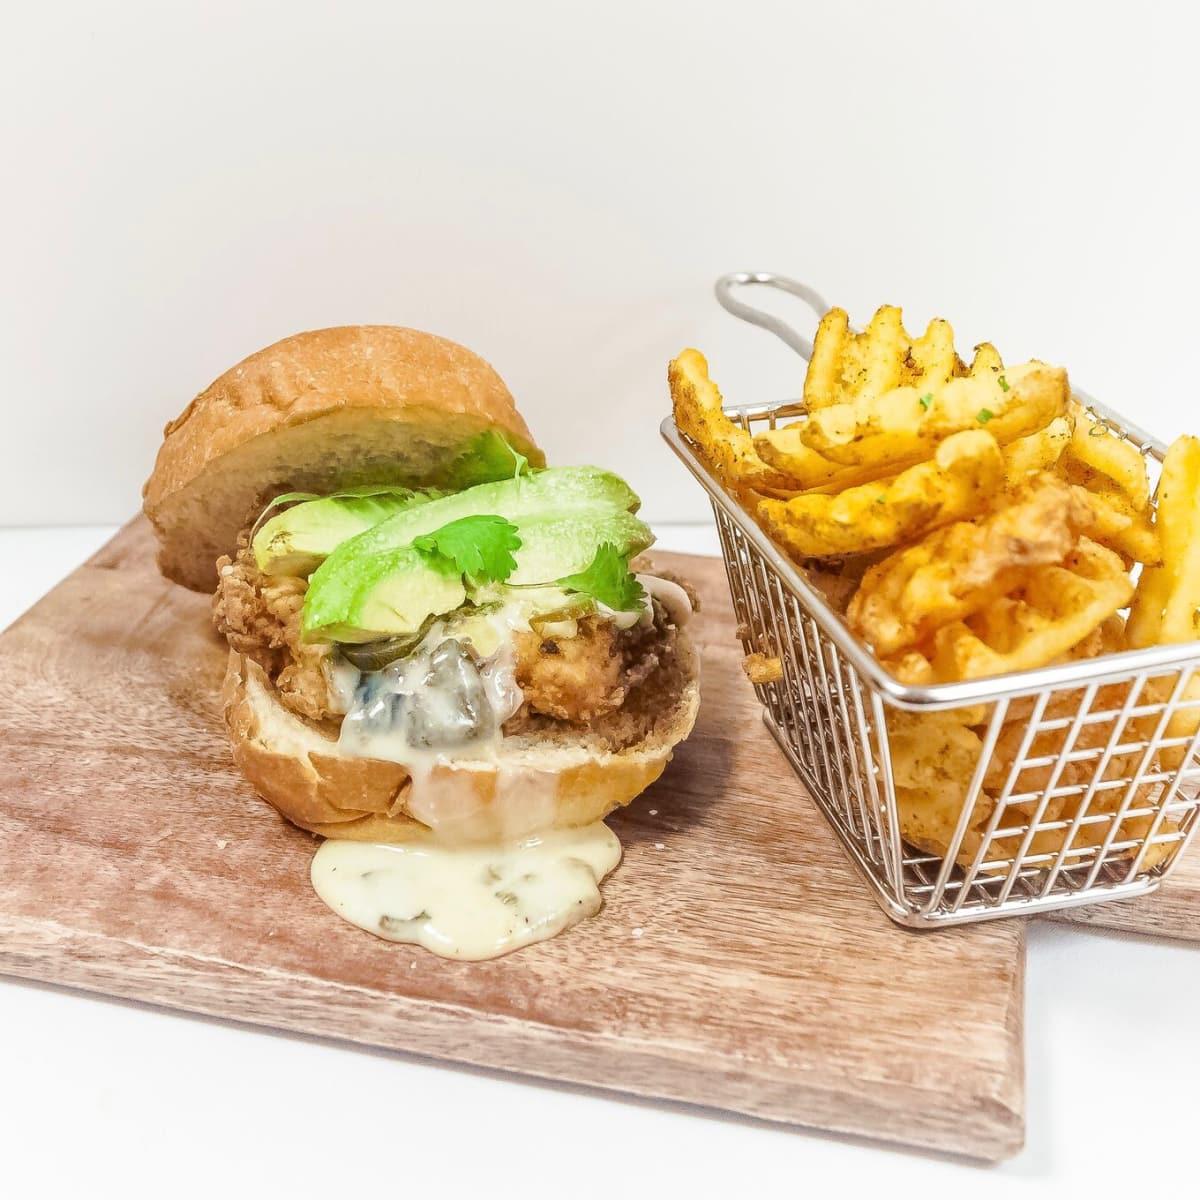 Krisp Bird & Batter Southwest sandwich